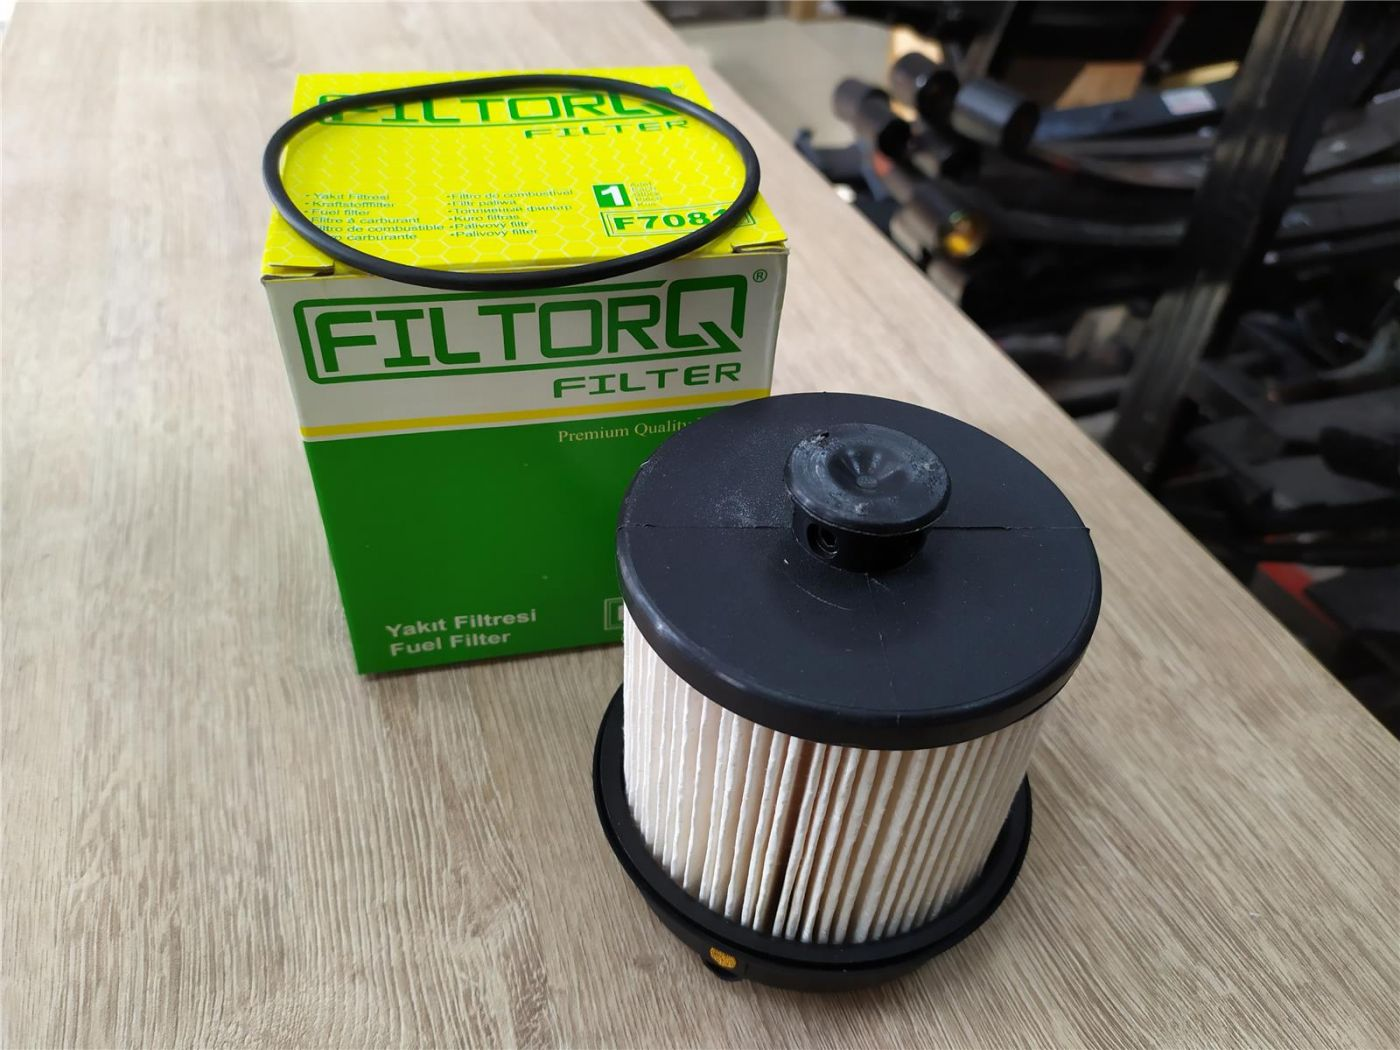 Фильтр топливный Isuzu NLR85 NMR85 NPR75 NQR75 NQR90 двигатель 4JJ1 4HK1 6HK1